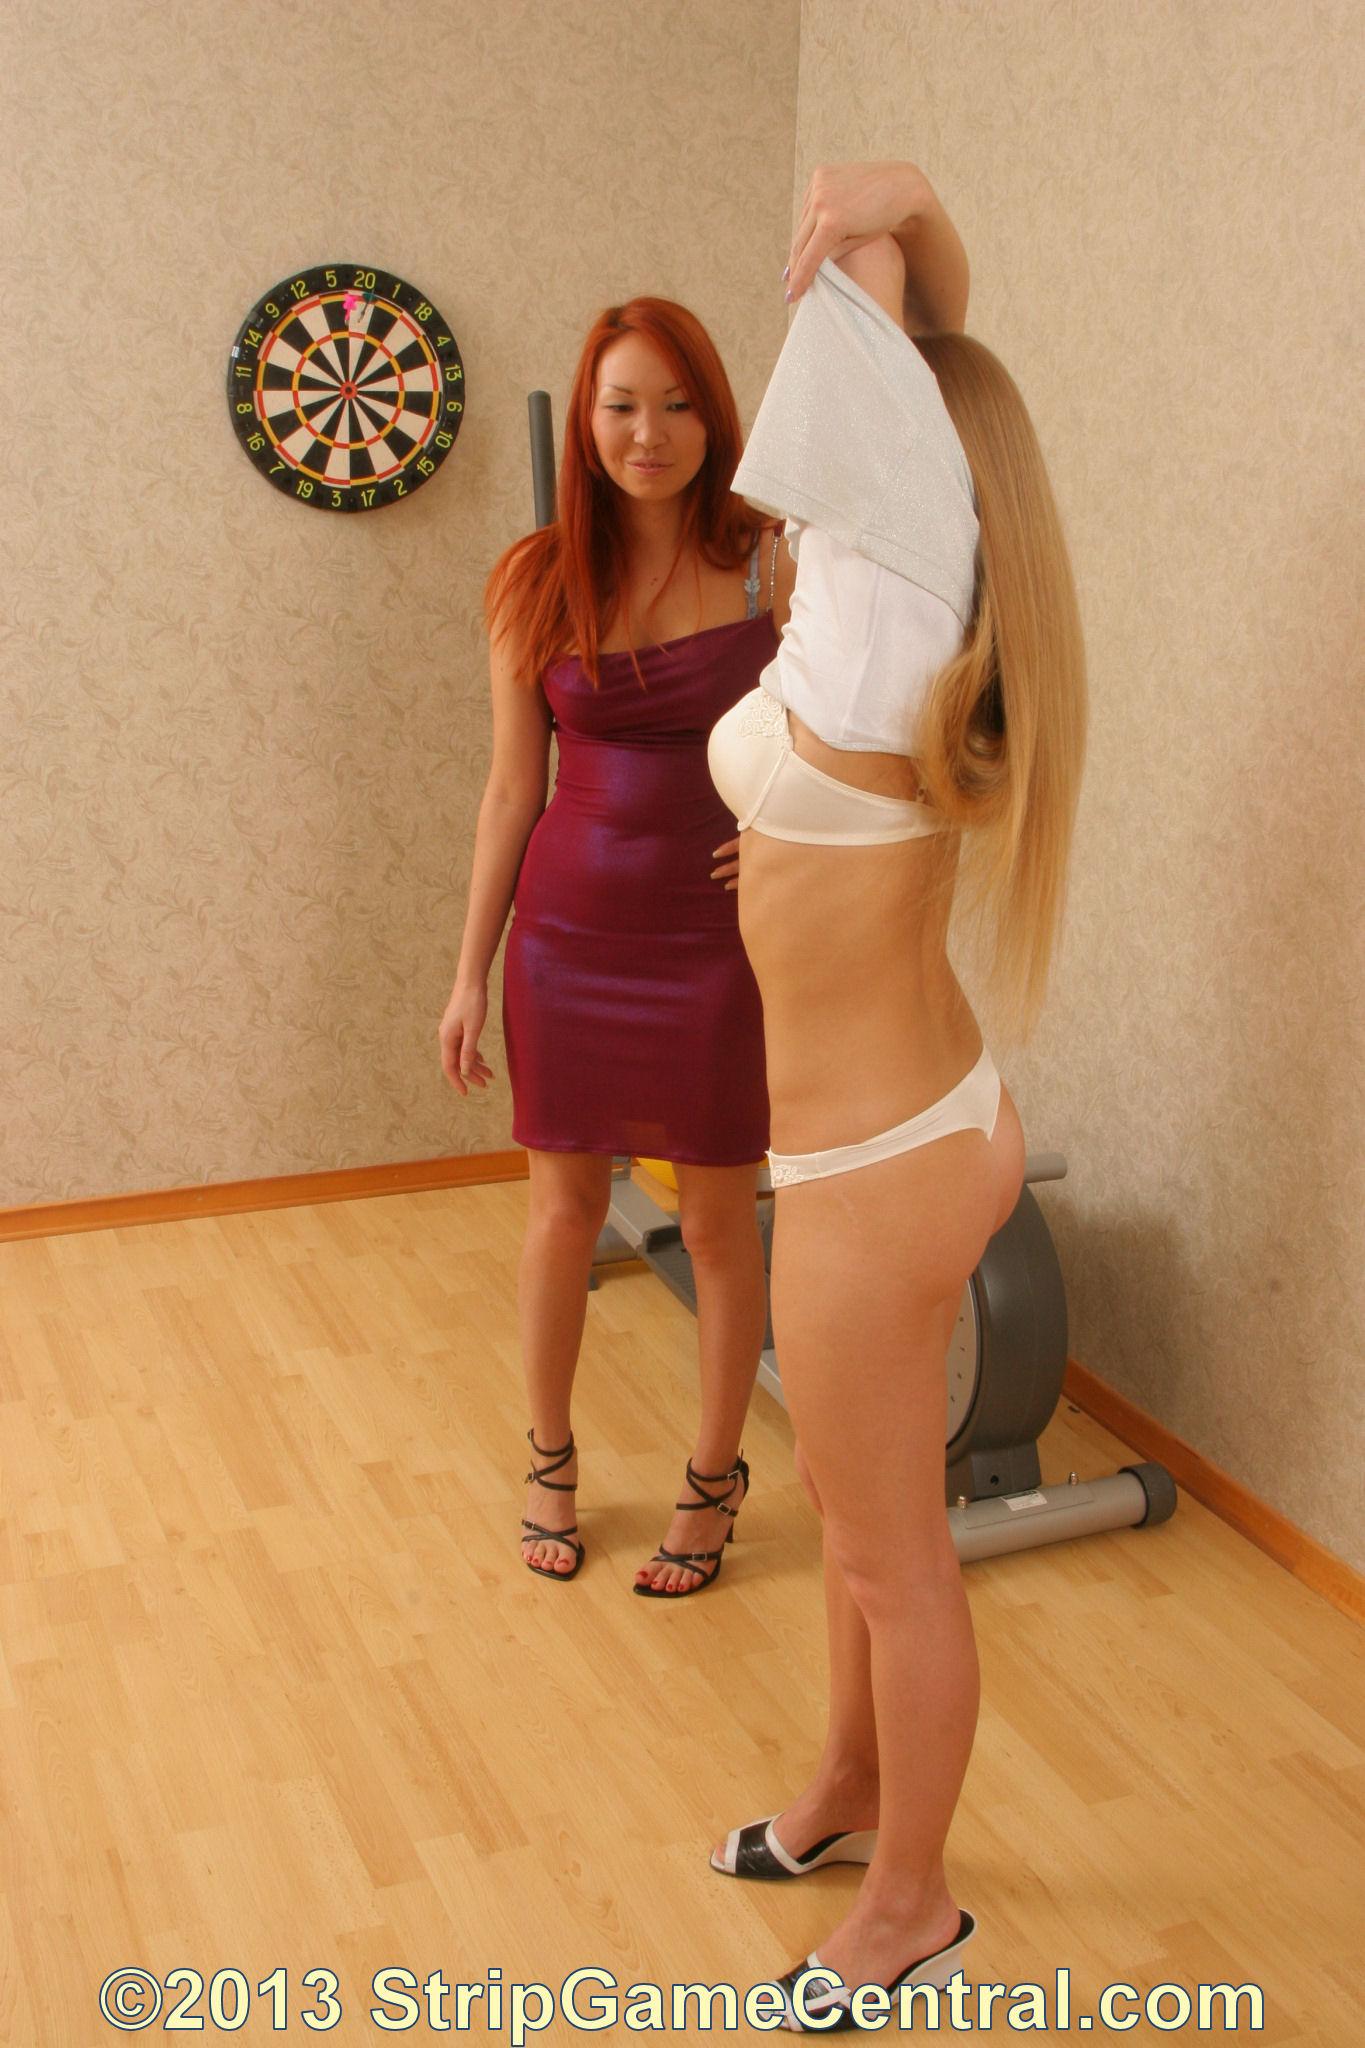 Cmnfnaked waitress playing darts 8